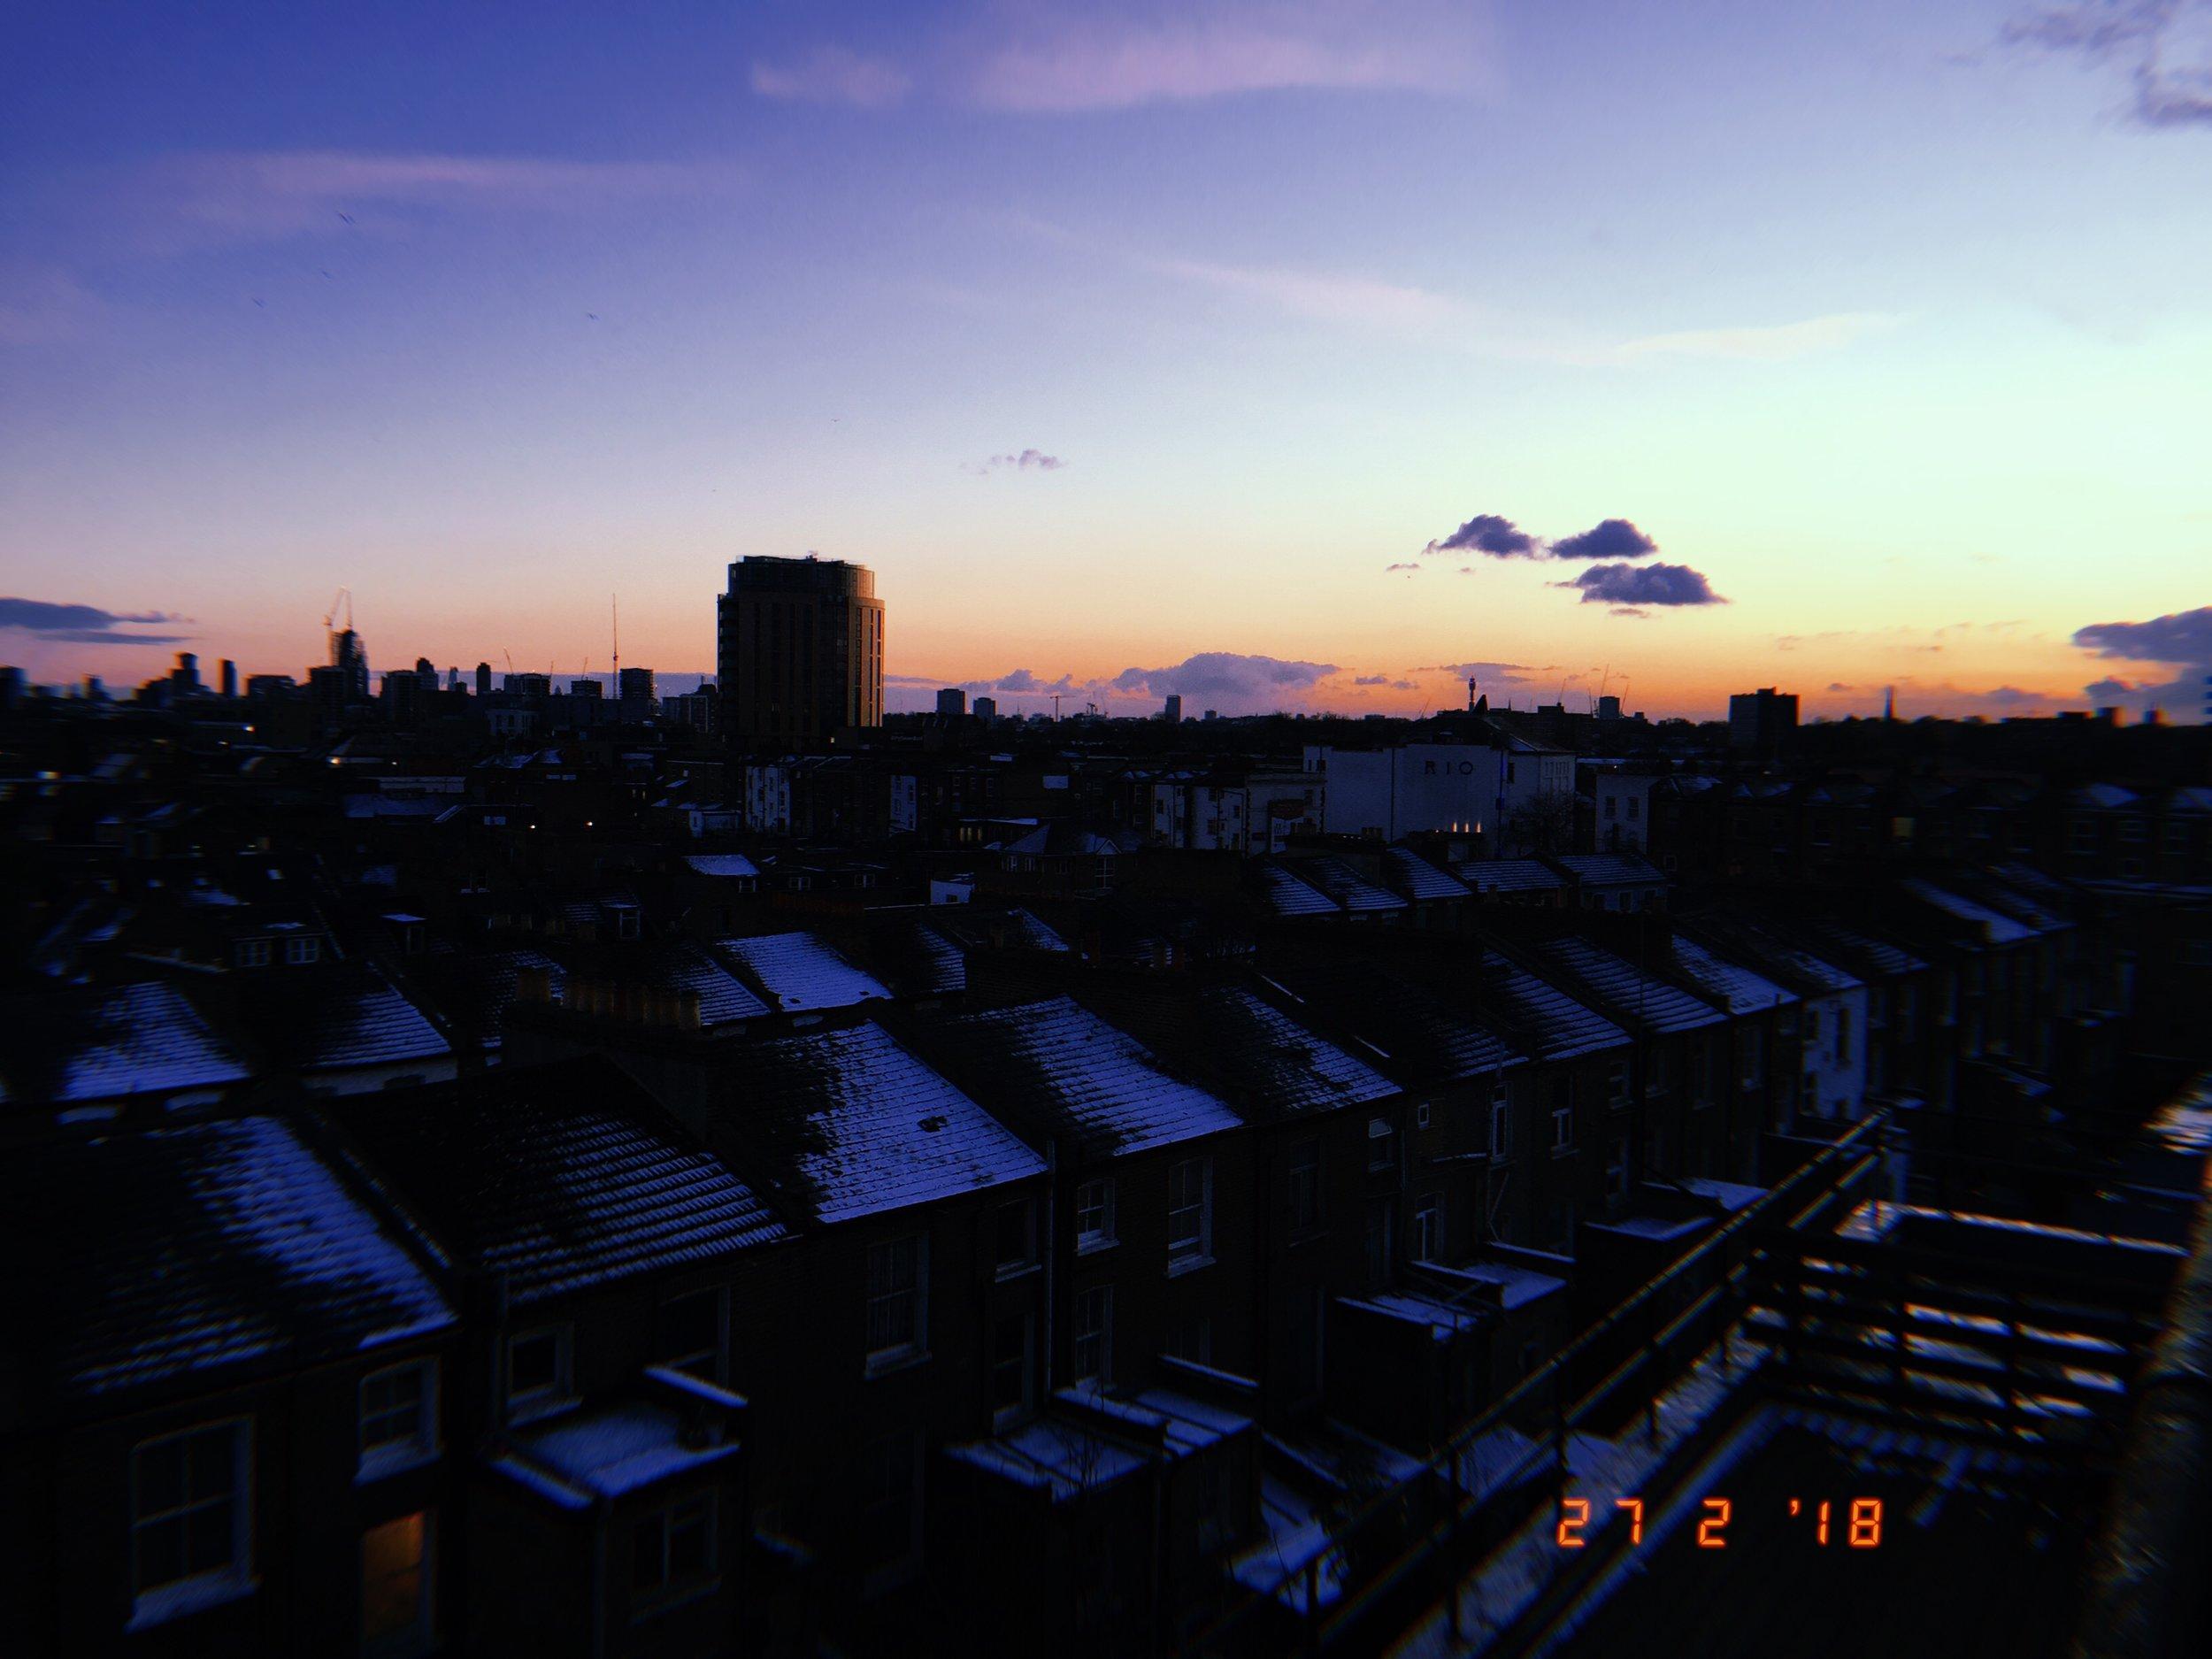 London, February 2018.